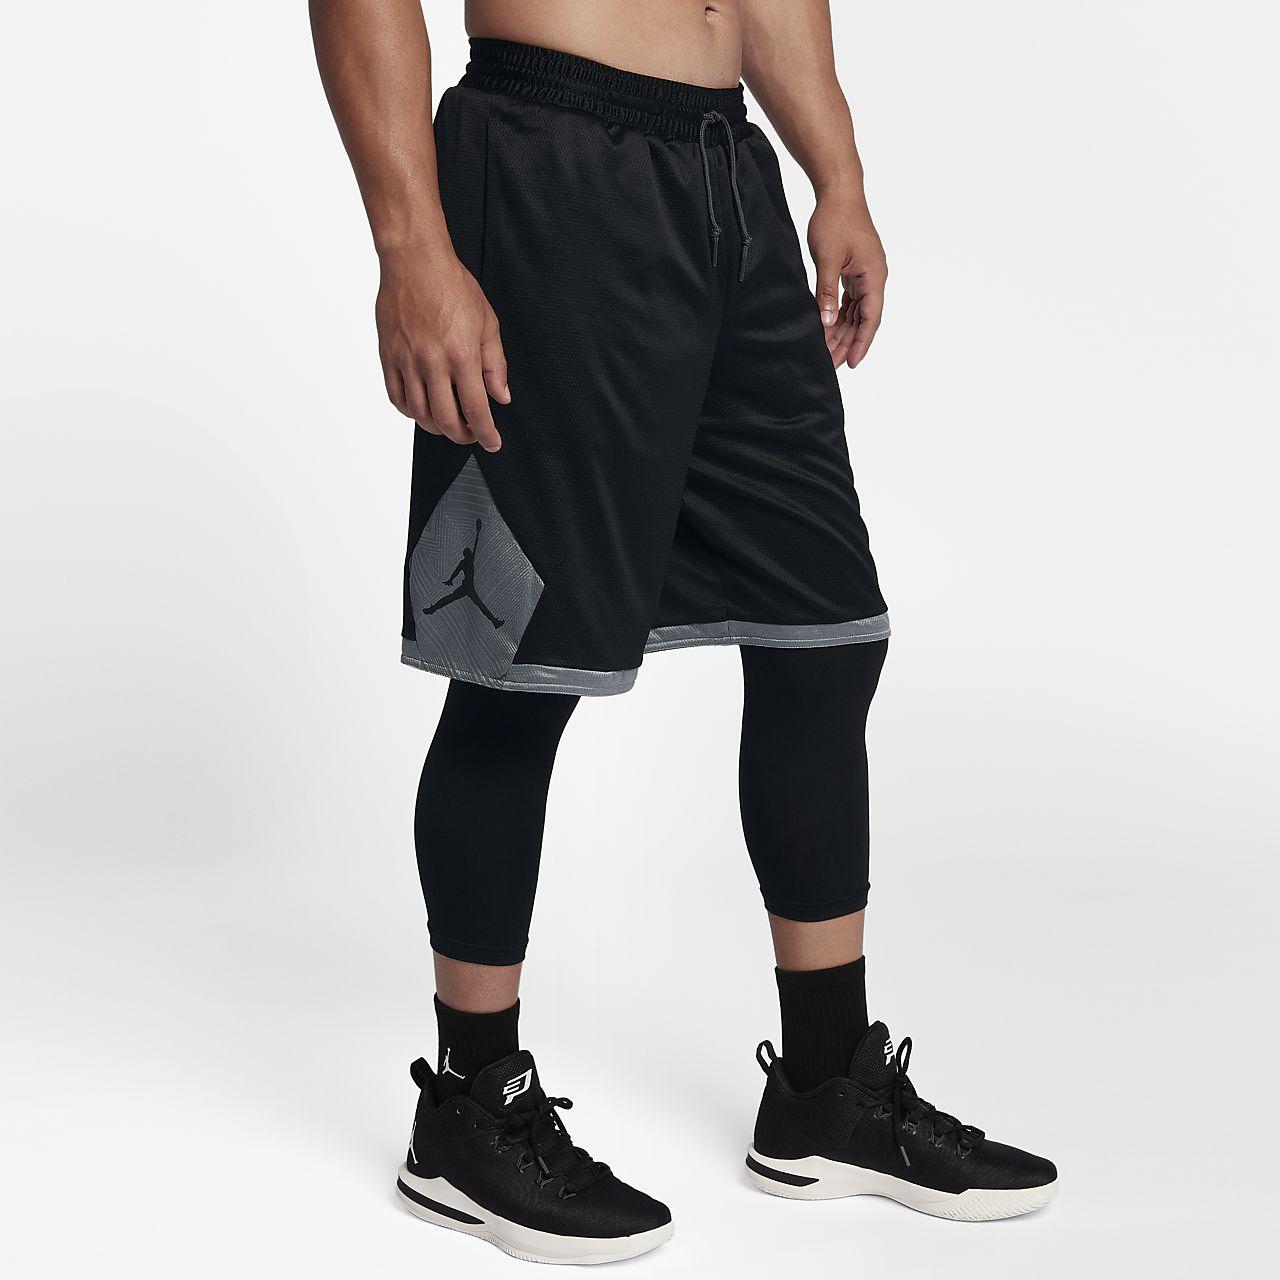 Air Jordan Pantalon De Basket-ball